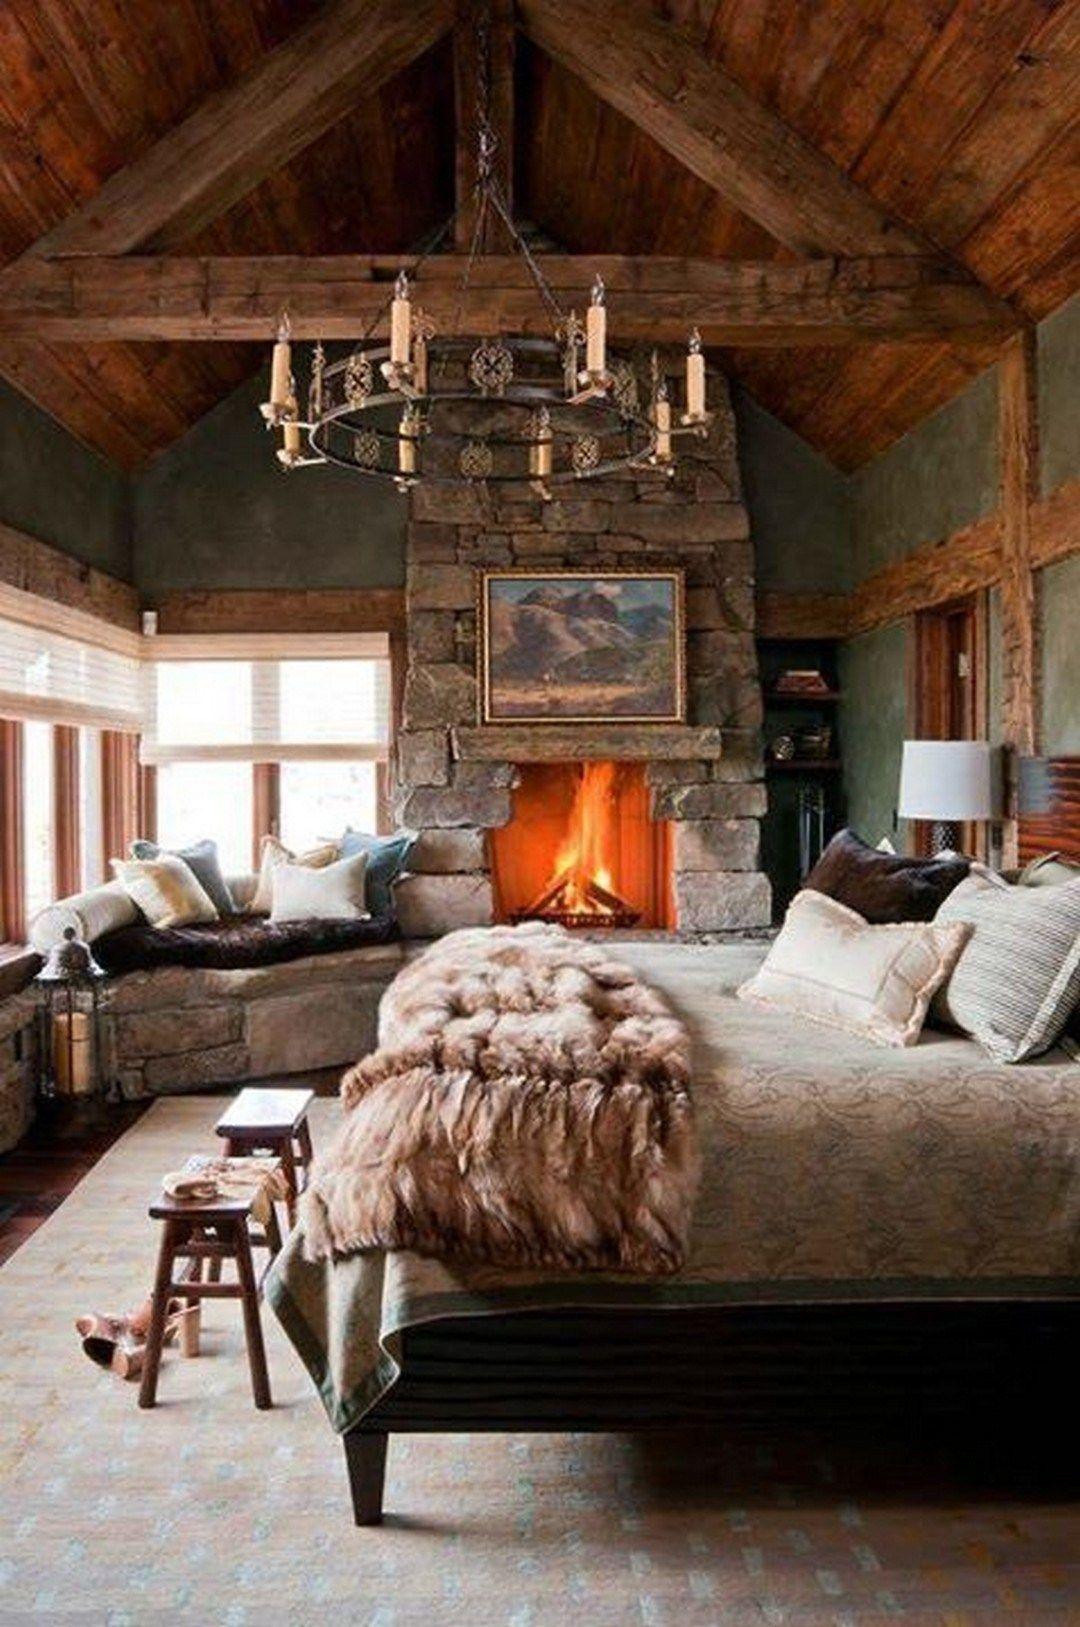 Modern Cozy Mountain Home Design Ideas 47 Cabin Living Rustic